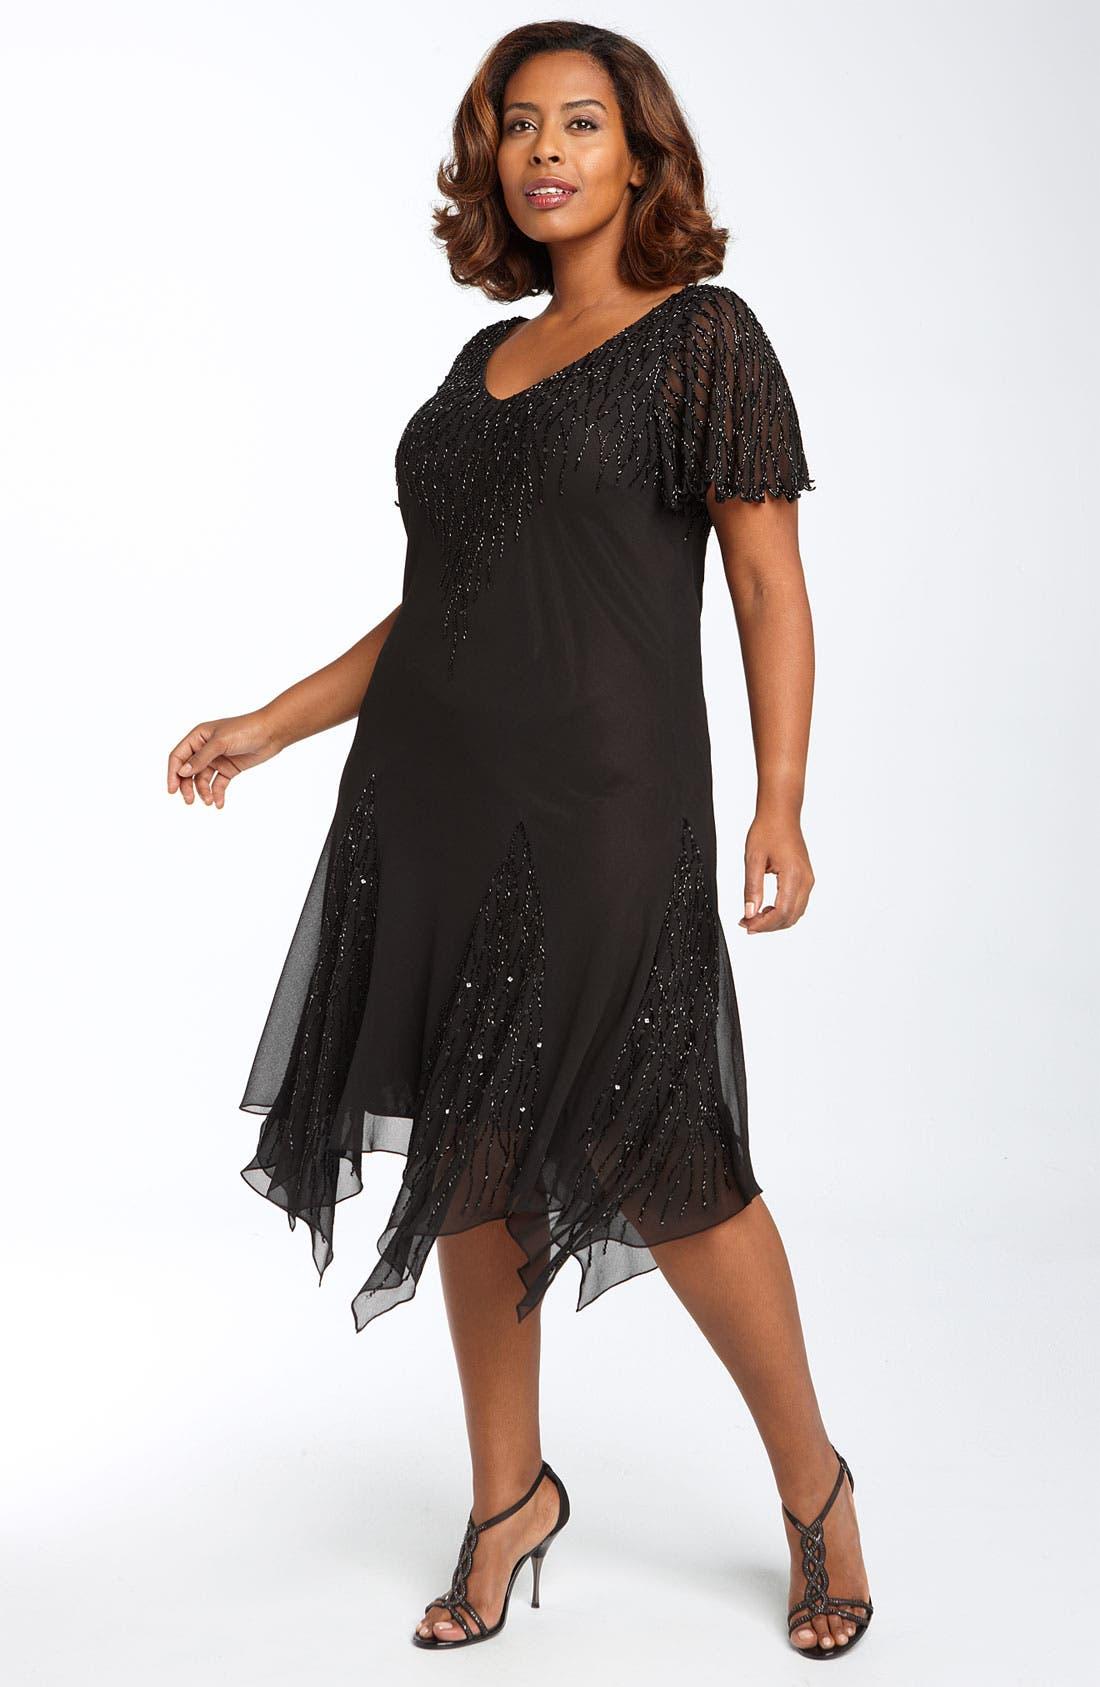 Alternate Image 1 Selected - J Kara Beaded Godet Dress (Plus Size)